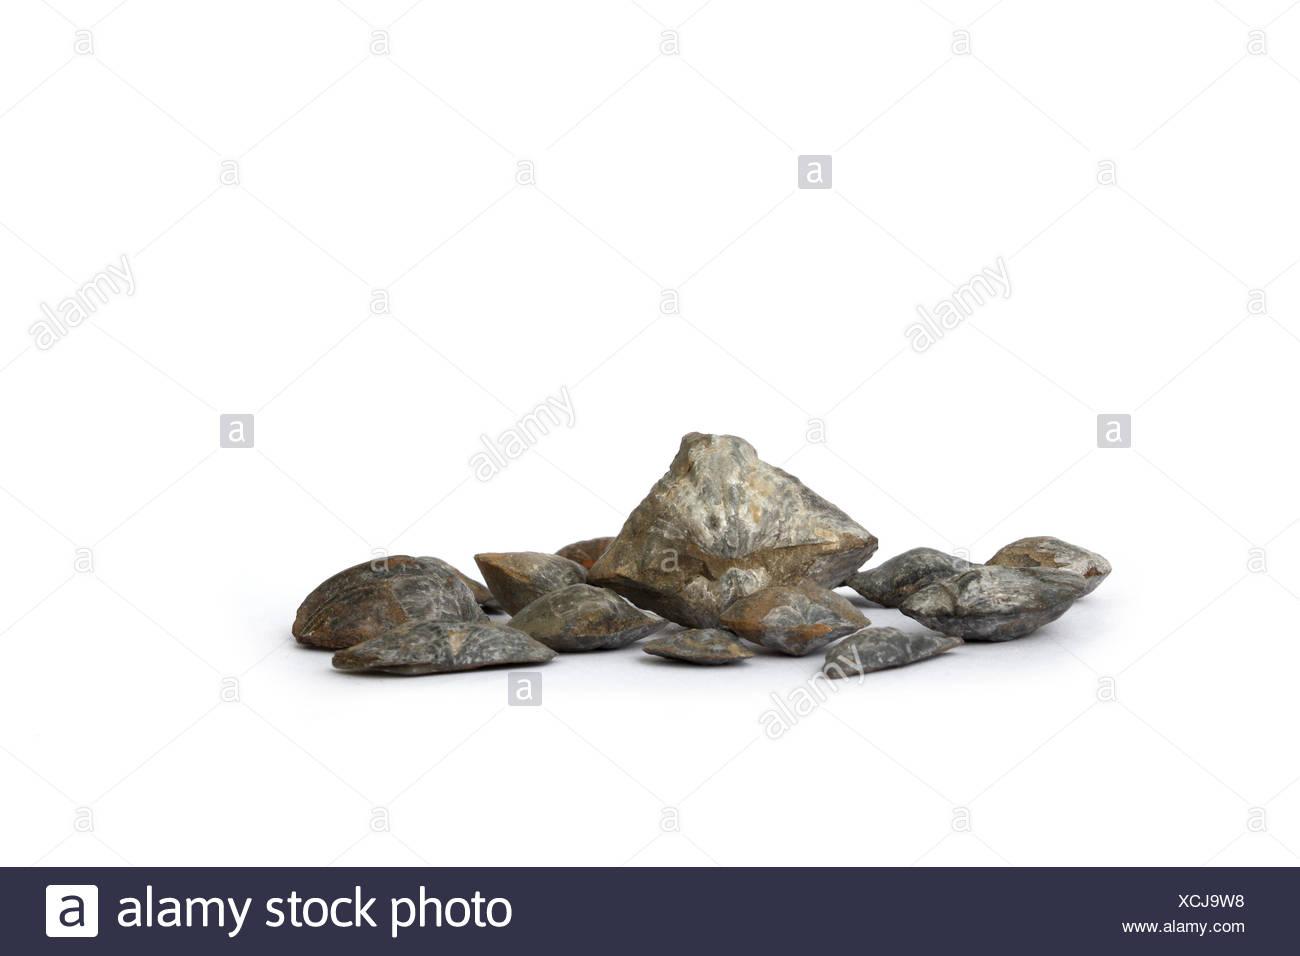 Fossil brachiopods - Stock Image